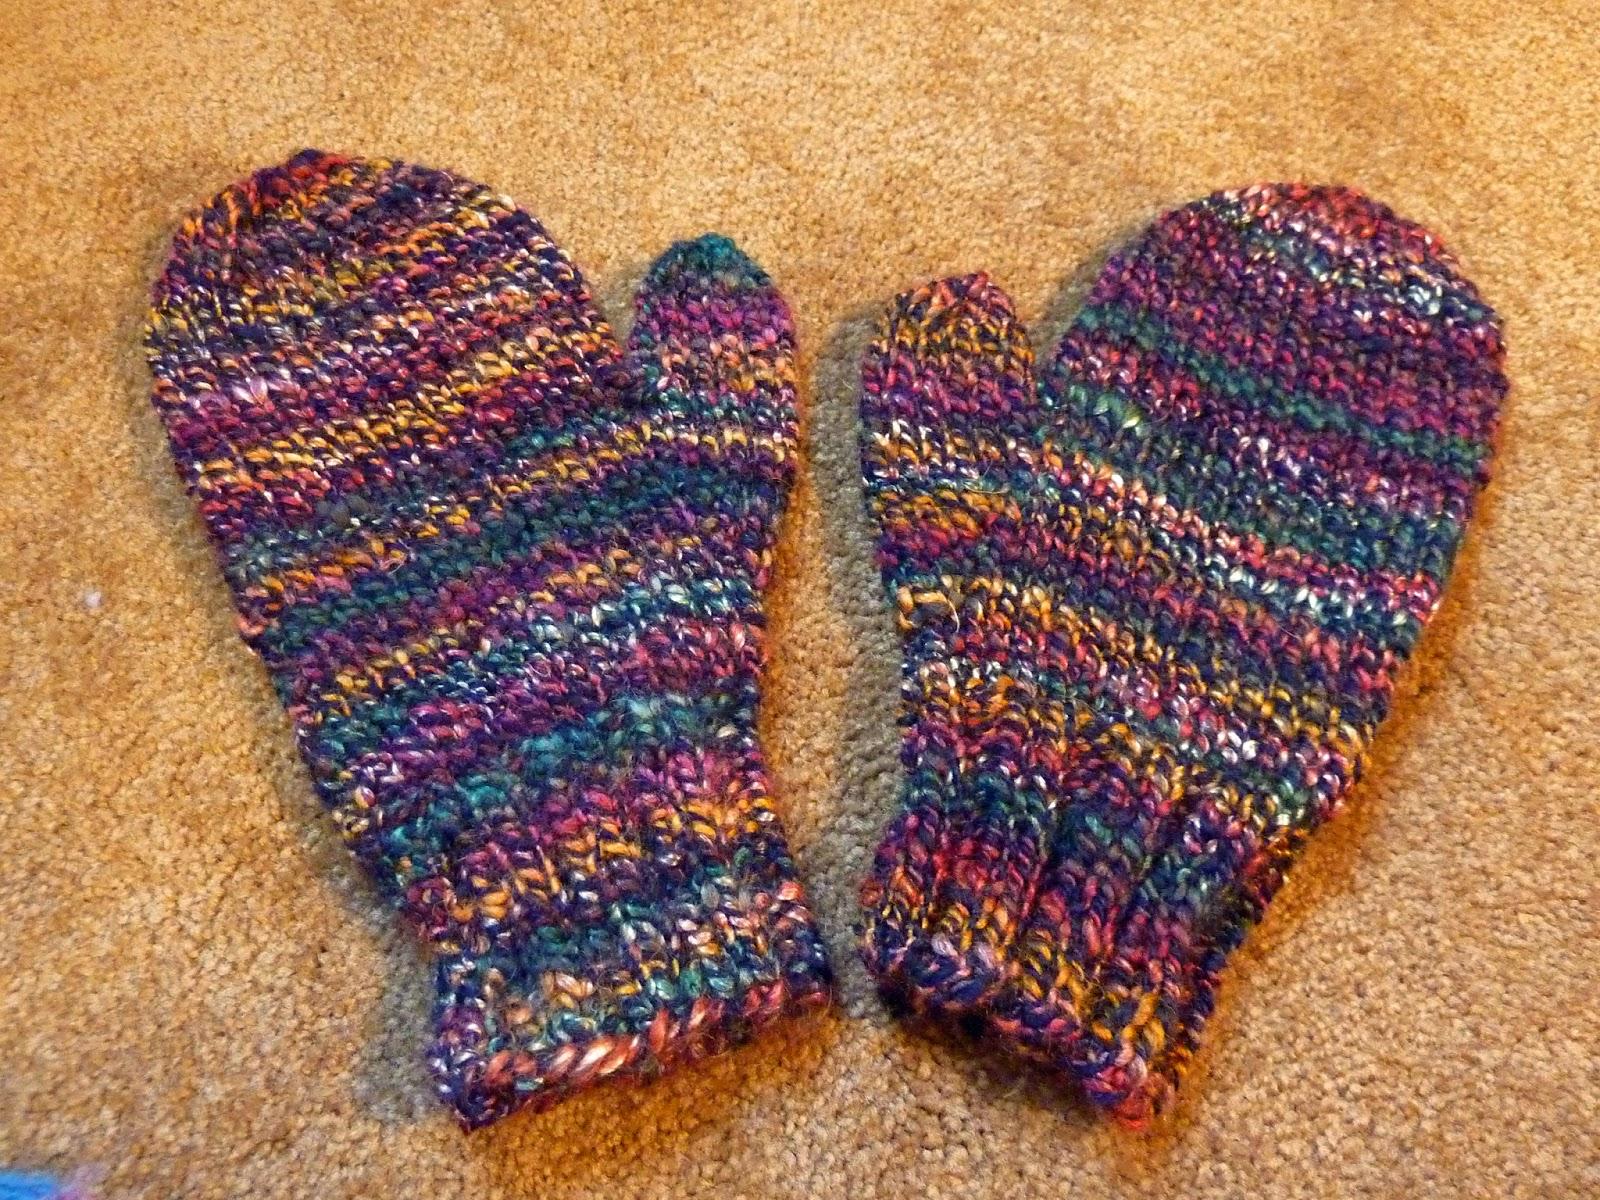 Spinning Memories - Knitting Love: 2 Needle Mitten Pattern